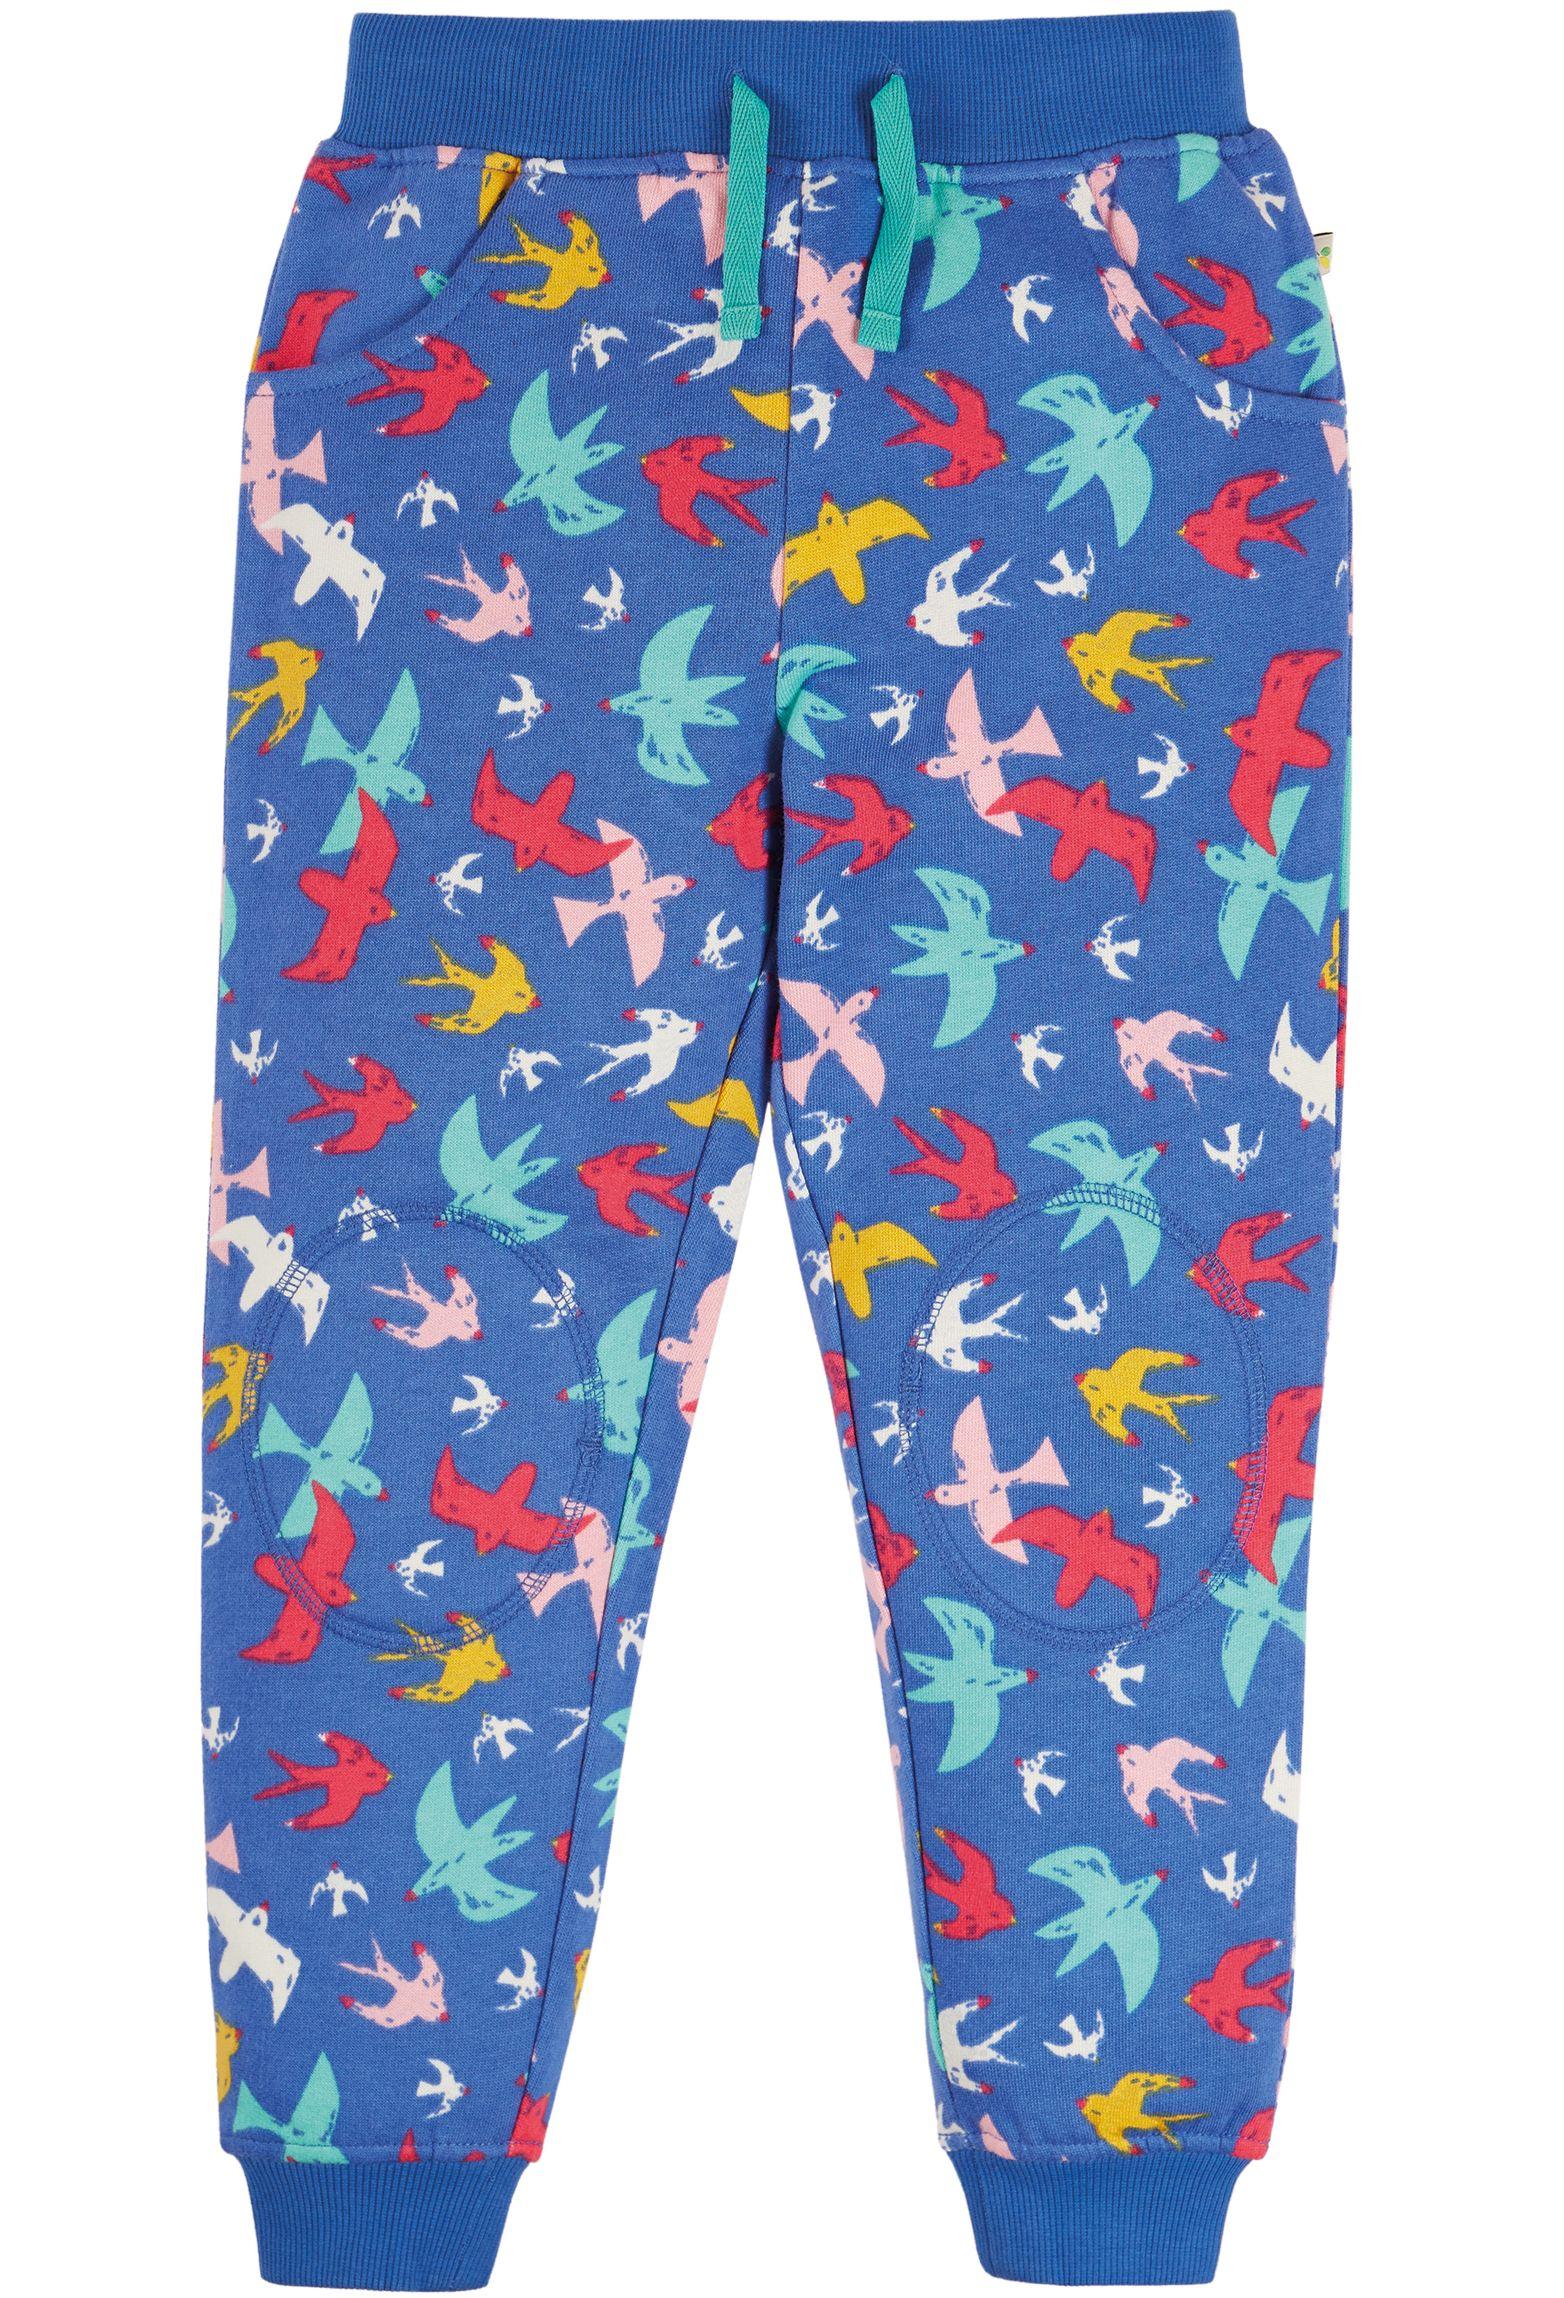 Bequeme Kinder-Hose mit bunten Vögeln